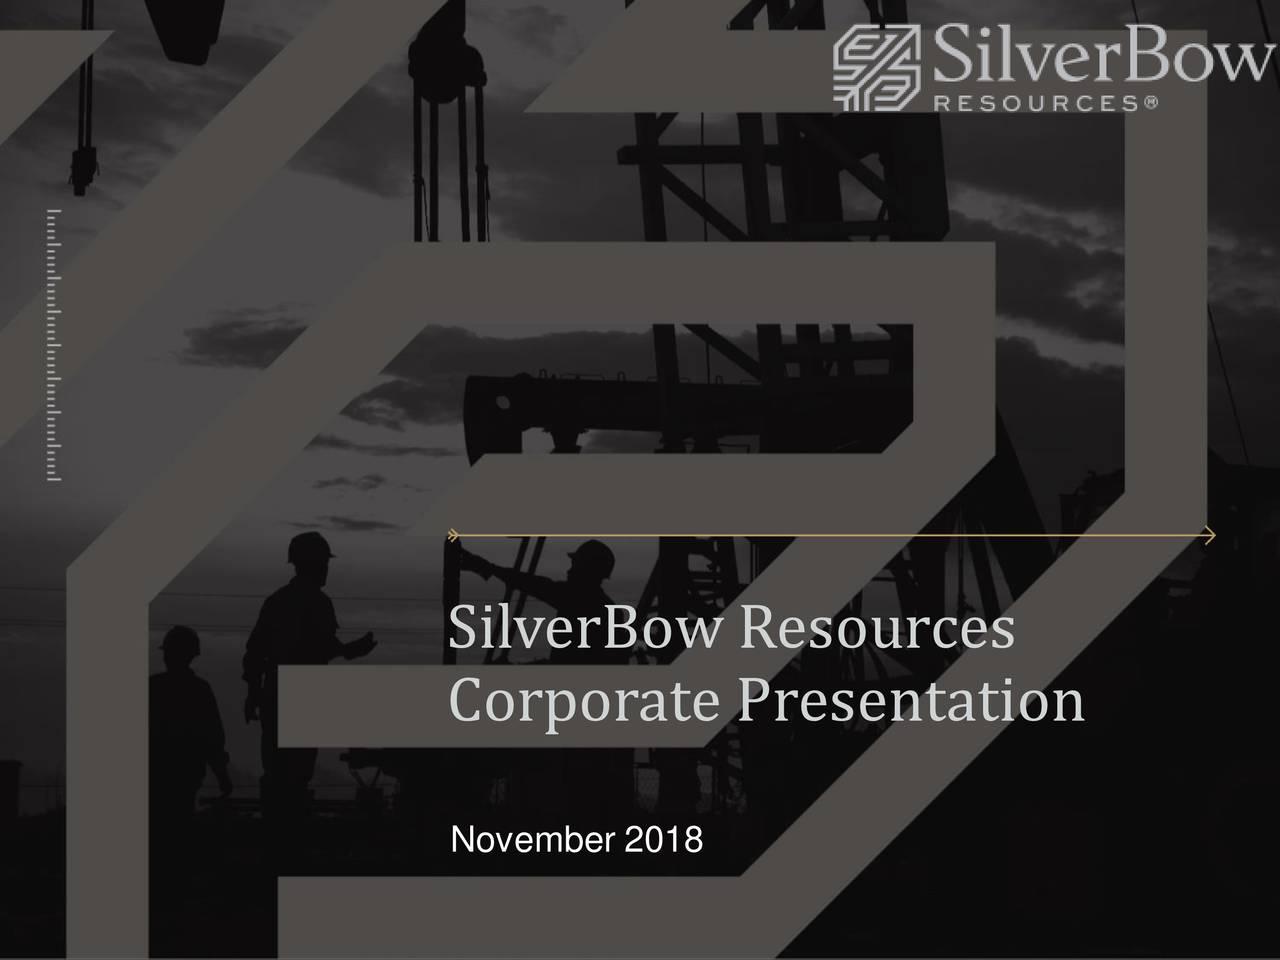 Corporate Presentation November 2018